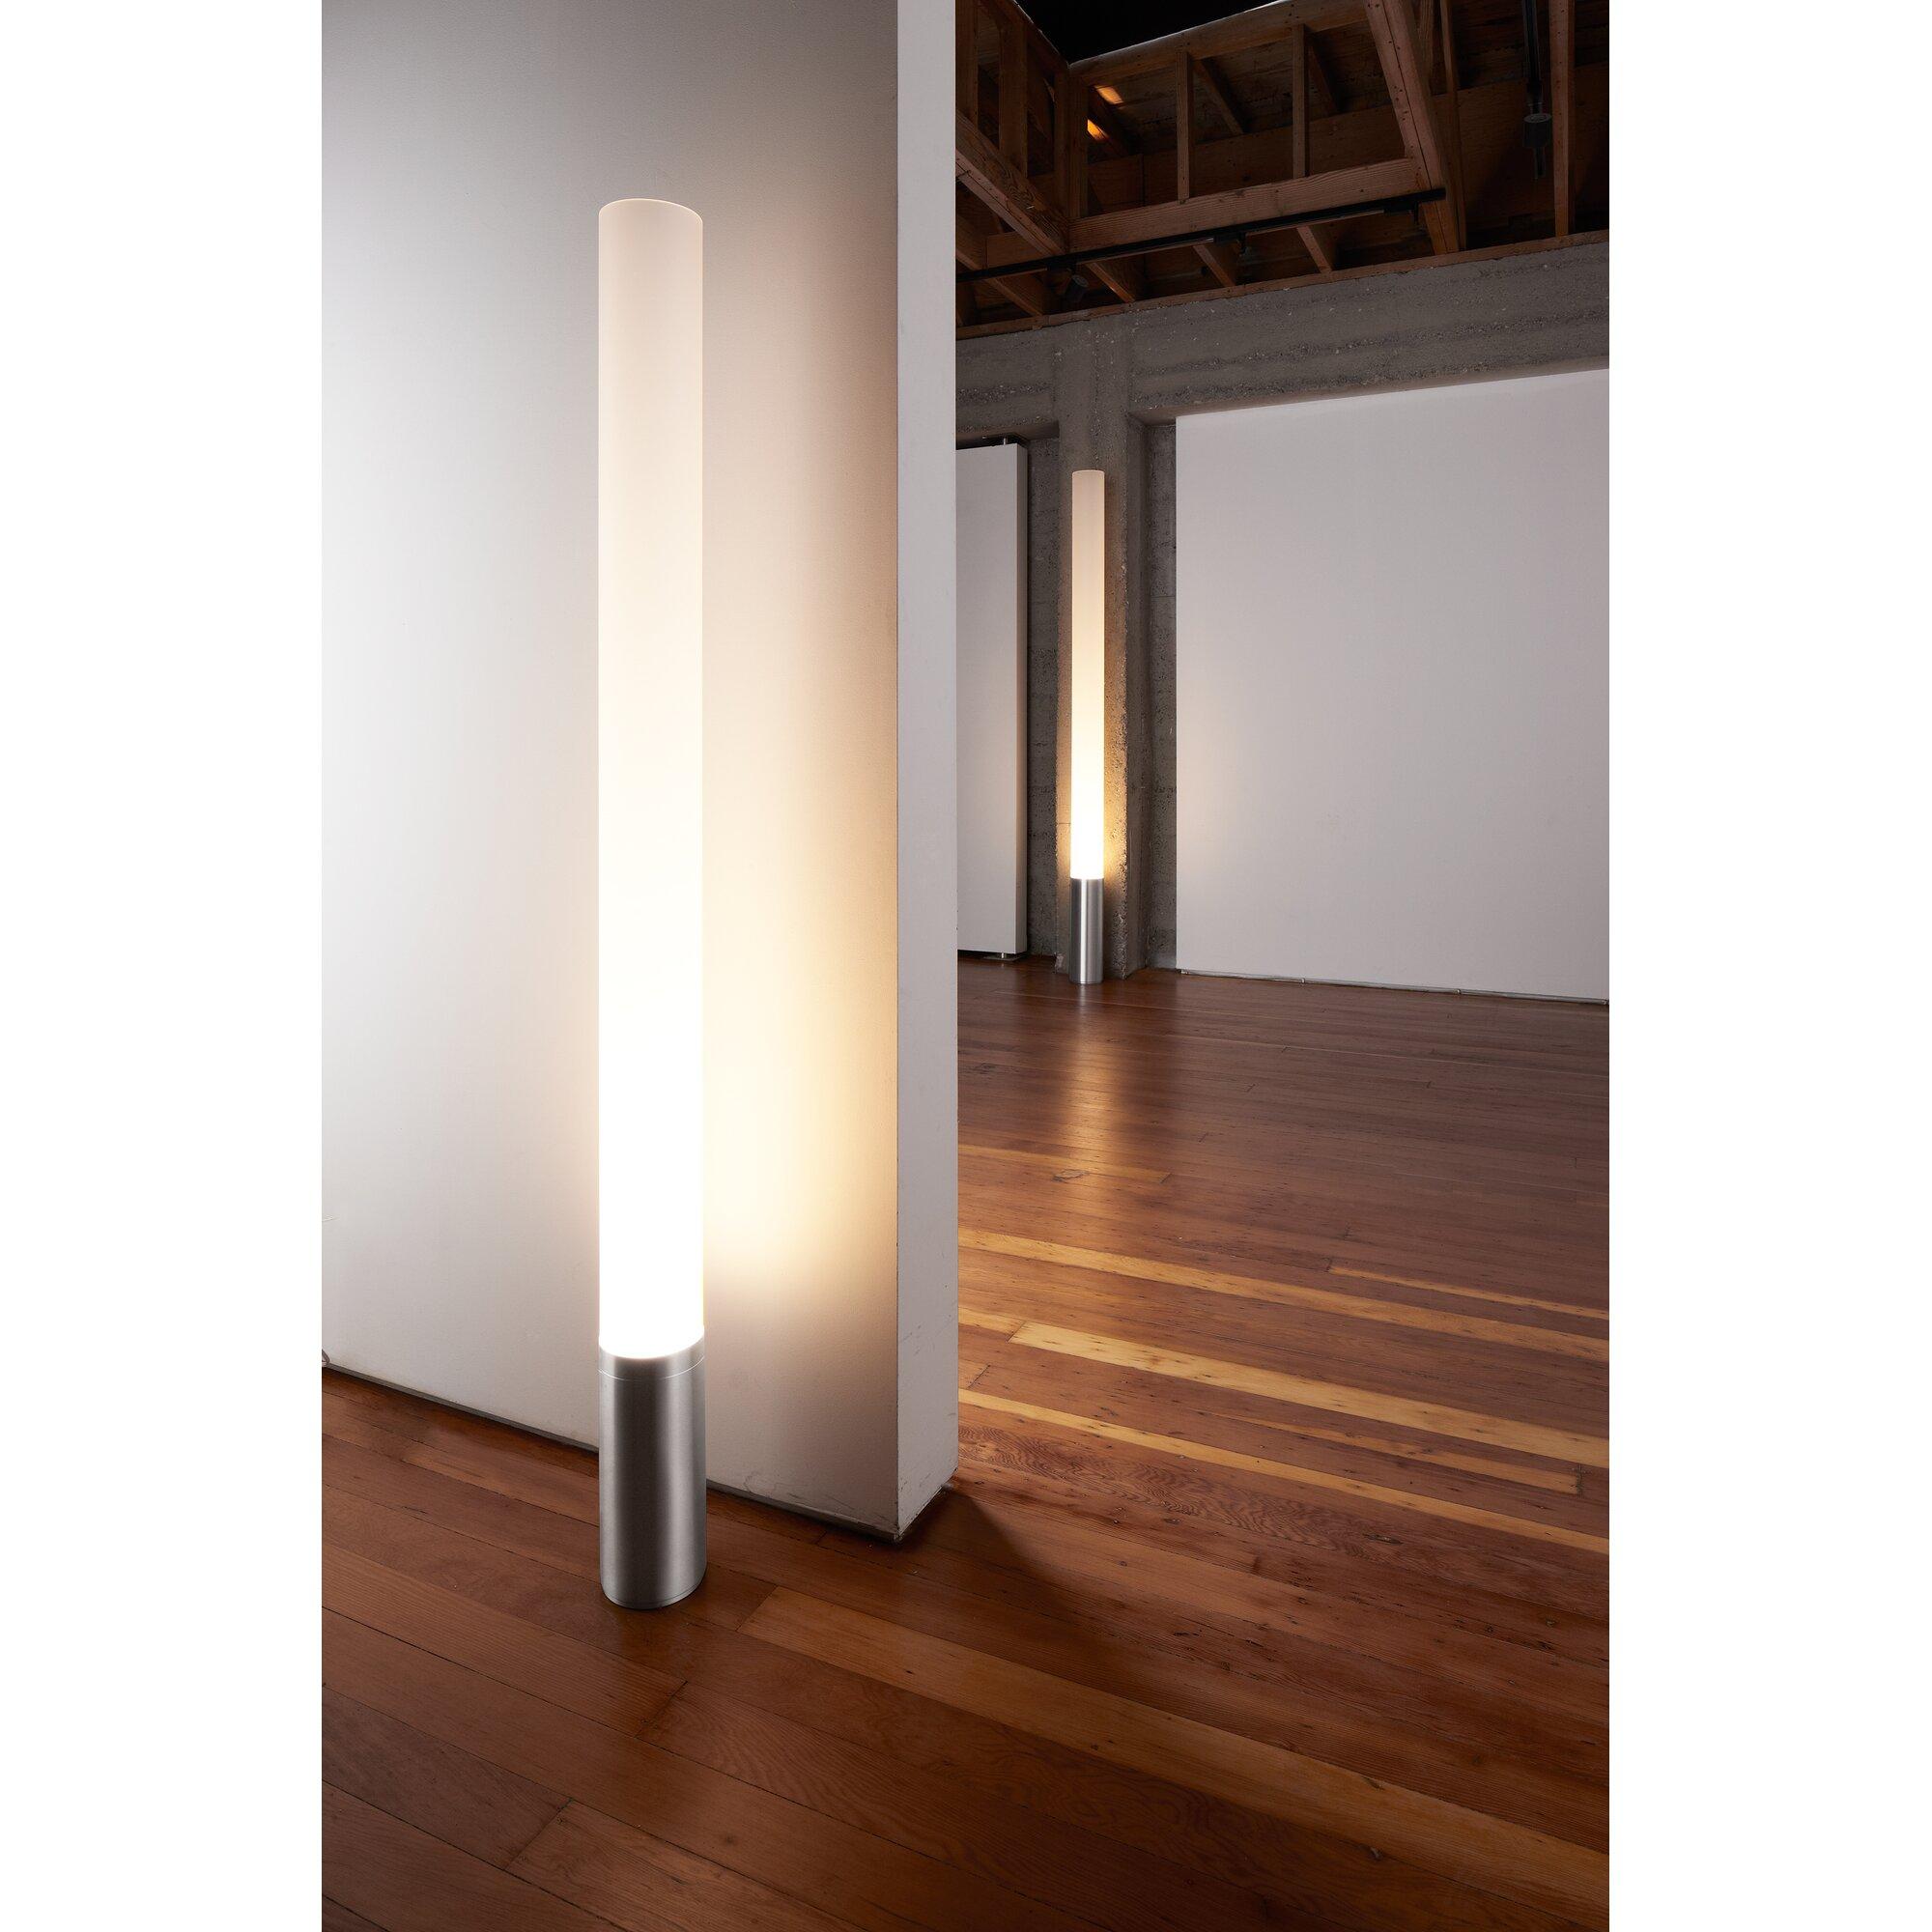 Pablo Designs Elise Column Floor Lamp Amp Reviews Wayfair Ca